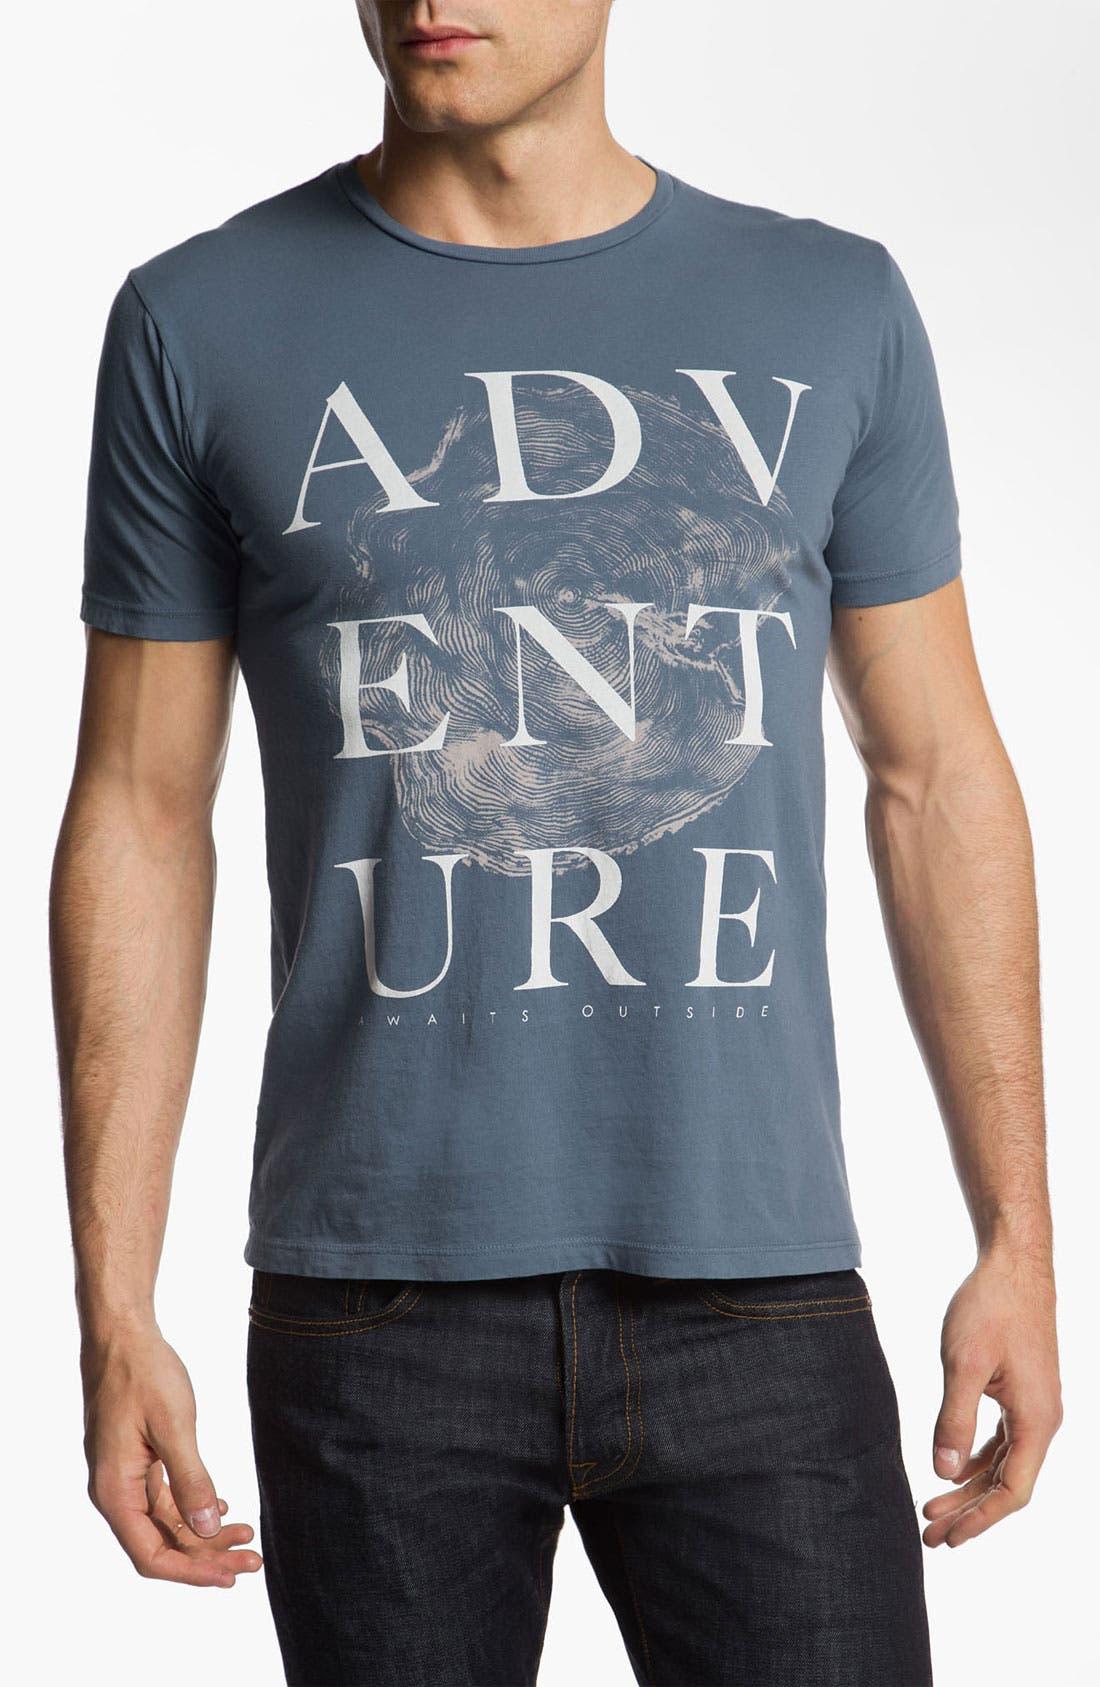 Main Image - Altru 'Adventure' Graphic T-Shirt